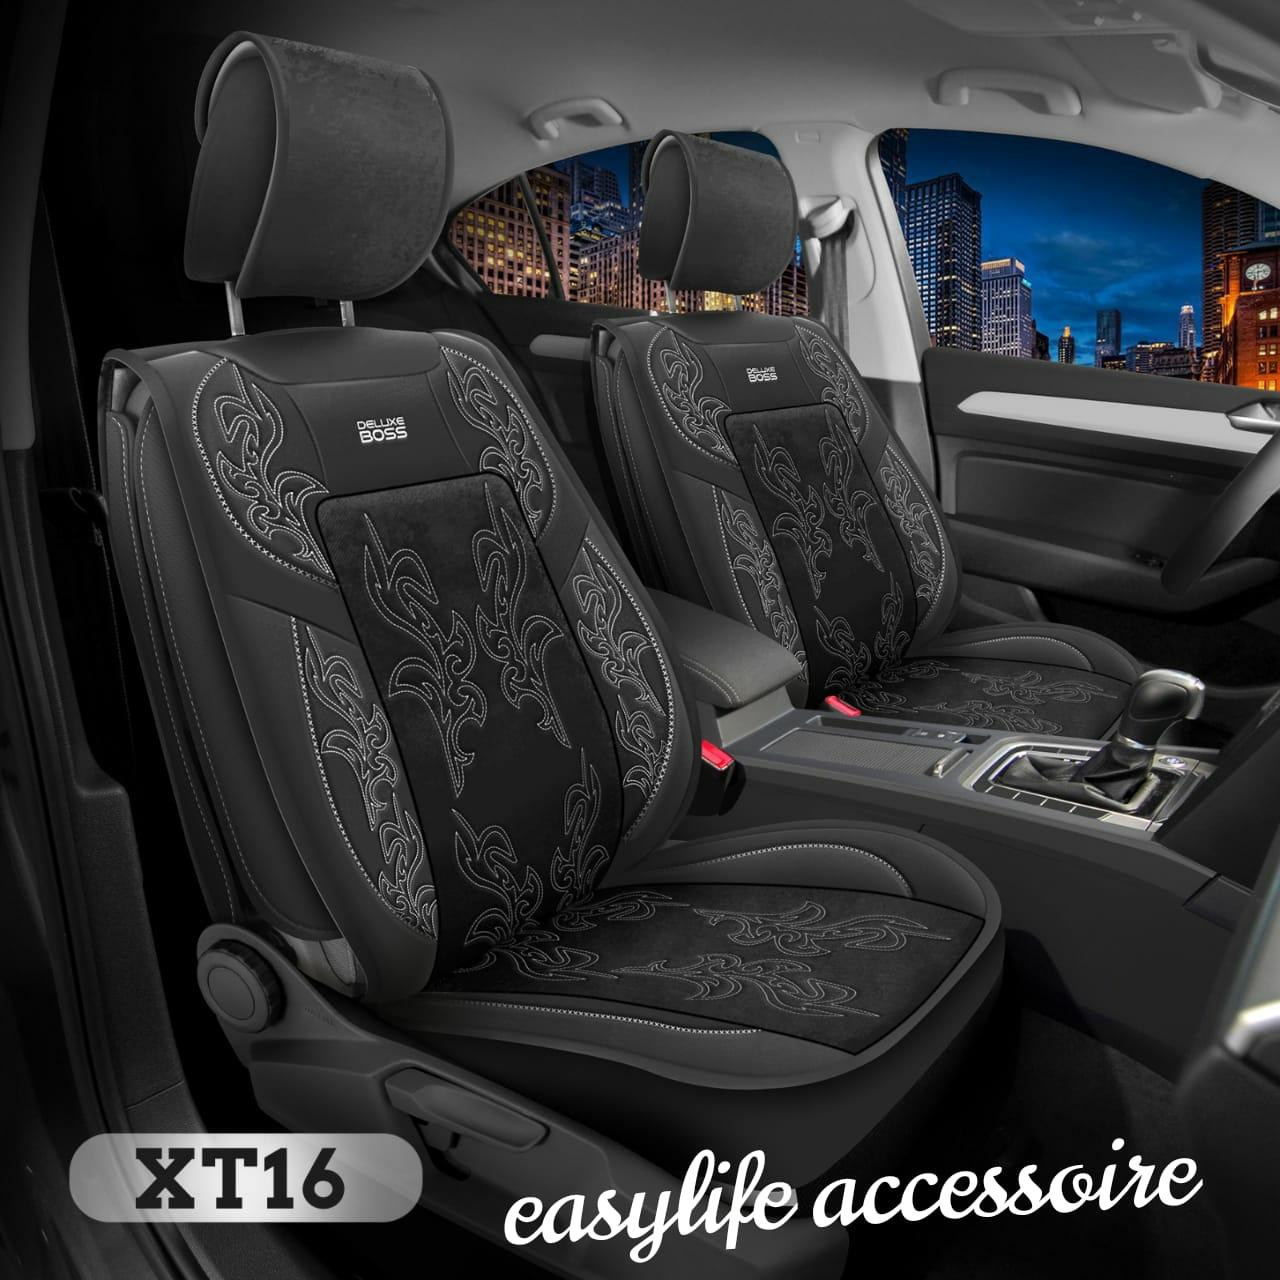 vip tissu غلاف مقاعد السيارة